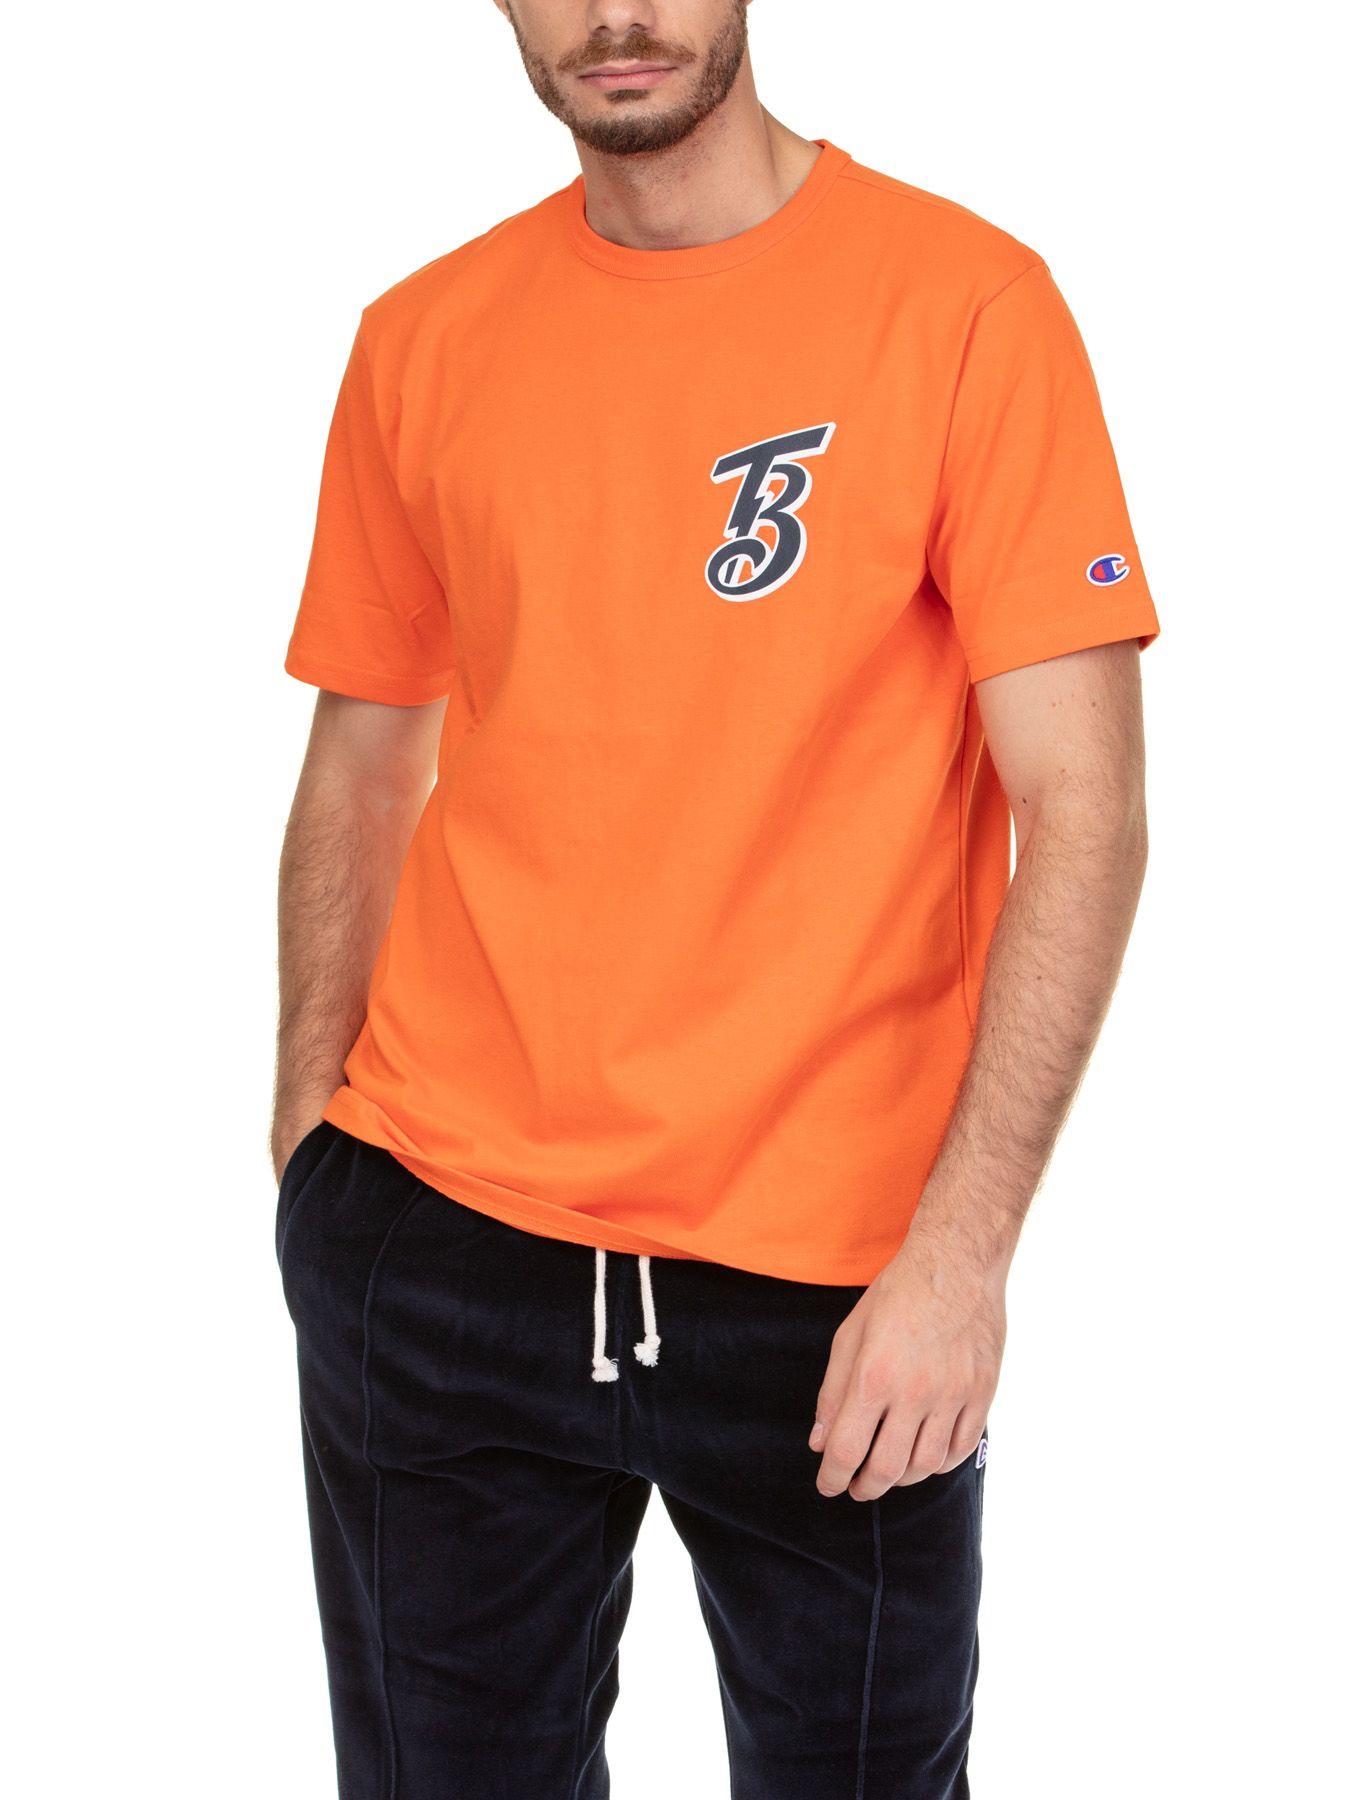 Shoppable Search Men39s Digital Circuit Board Tshirt 2xlarge Light Blue Clothing 76379e15a6a4730738b509db6a5fa602